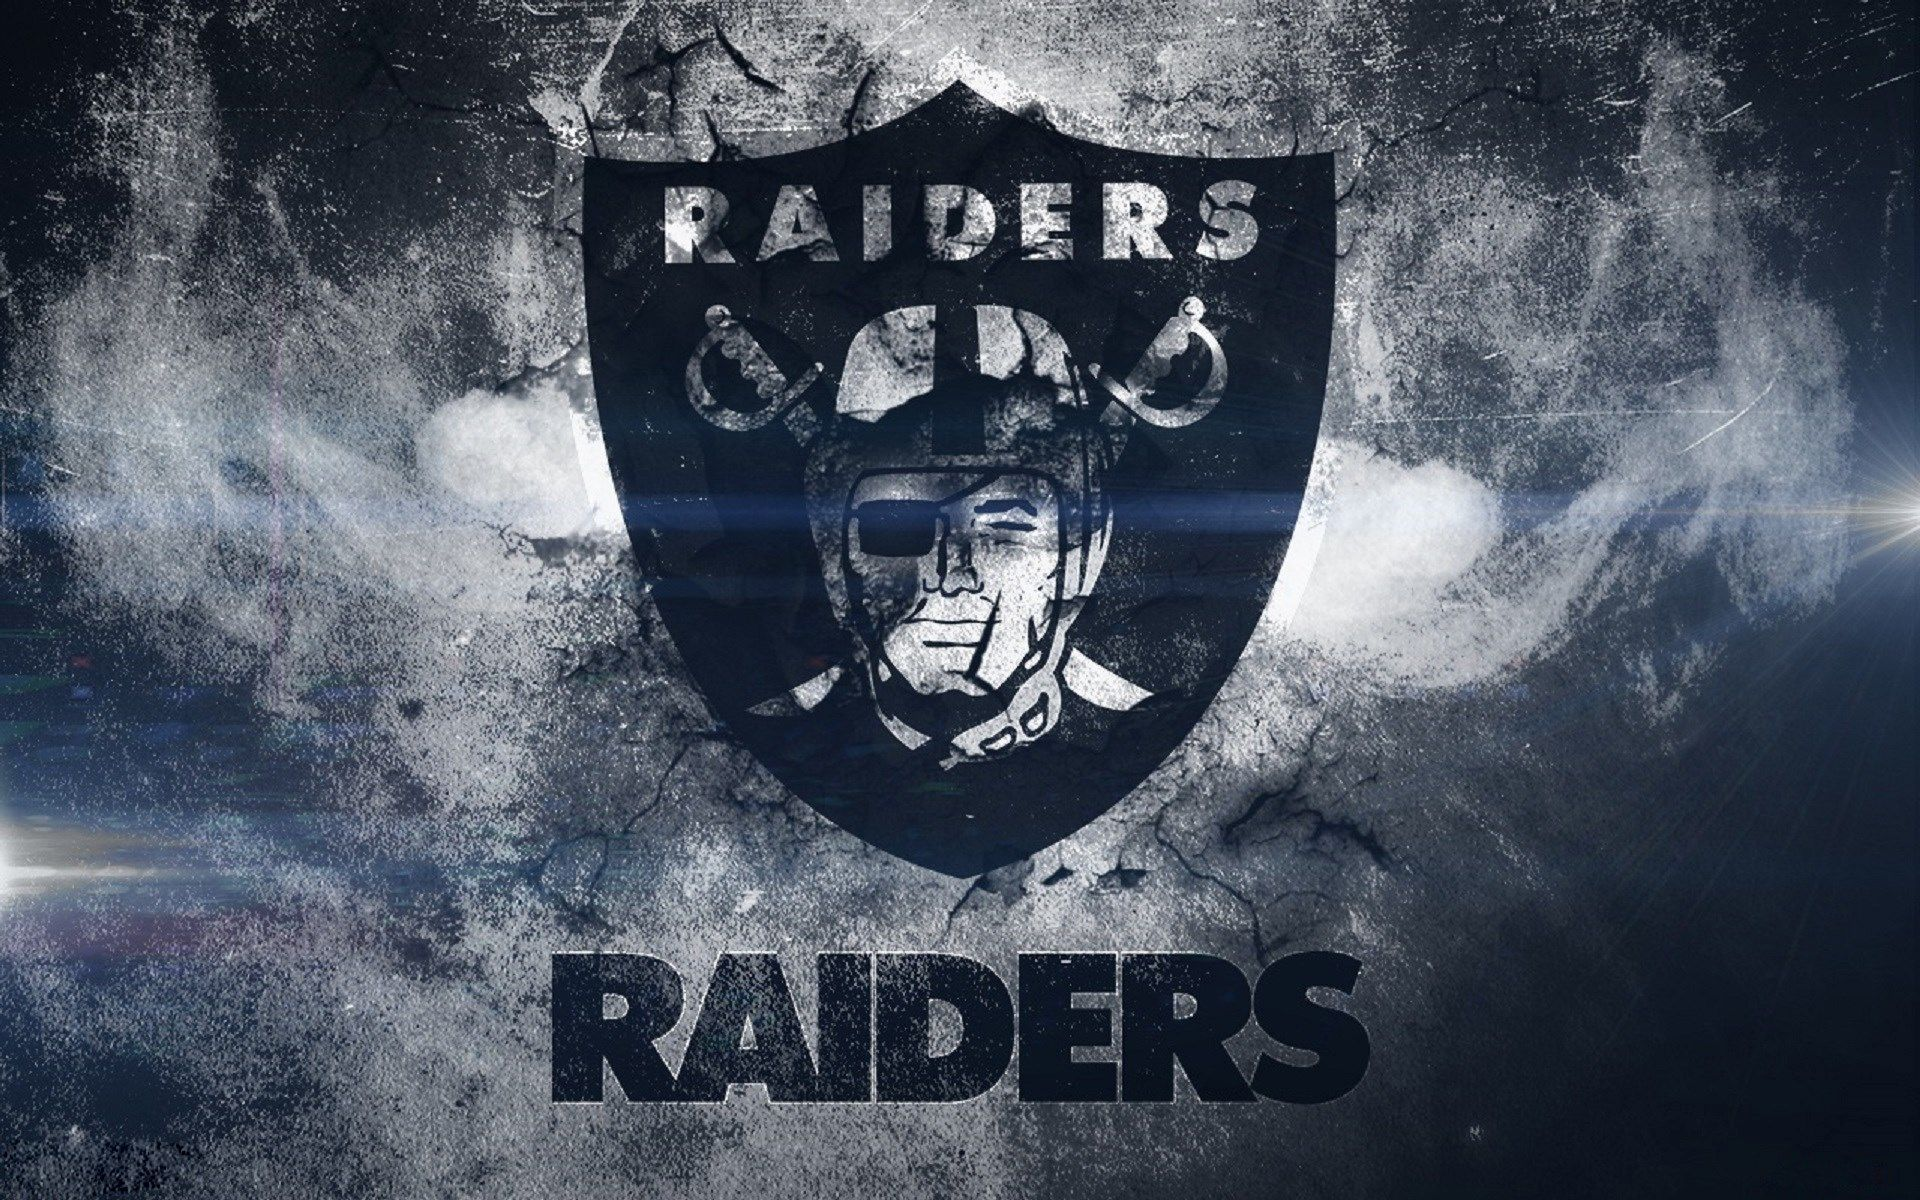 Oakland Raiders Wallpaper Hd Download